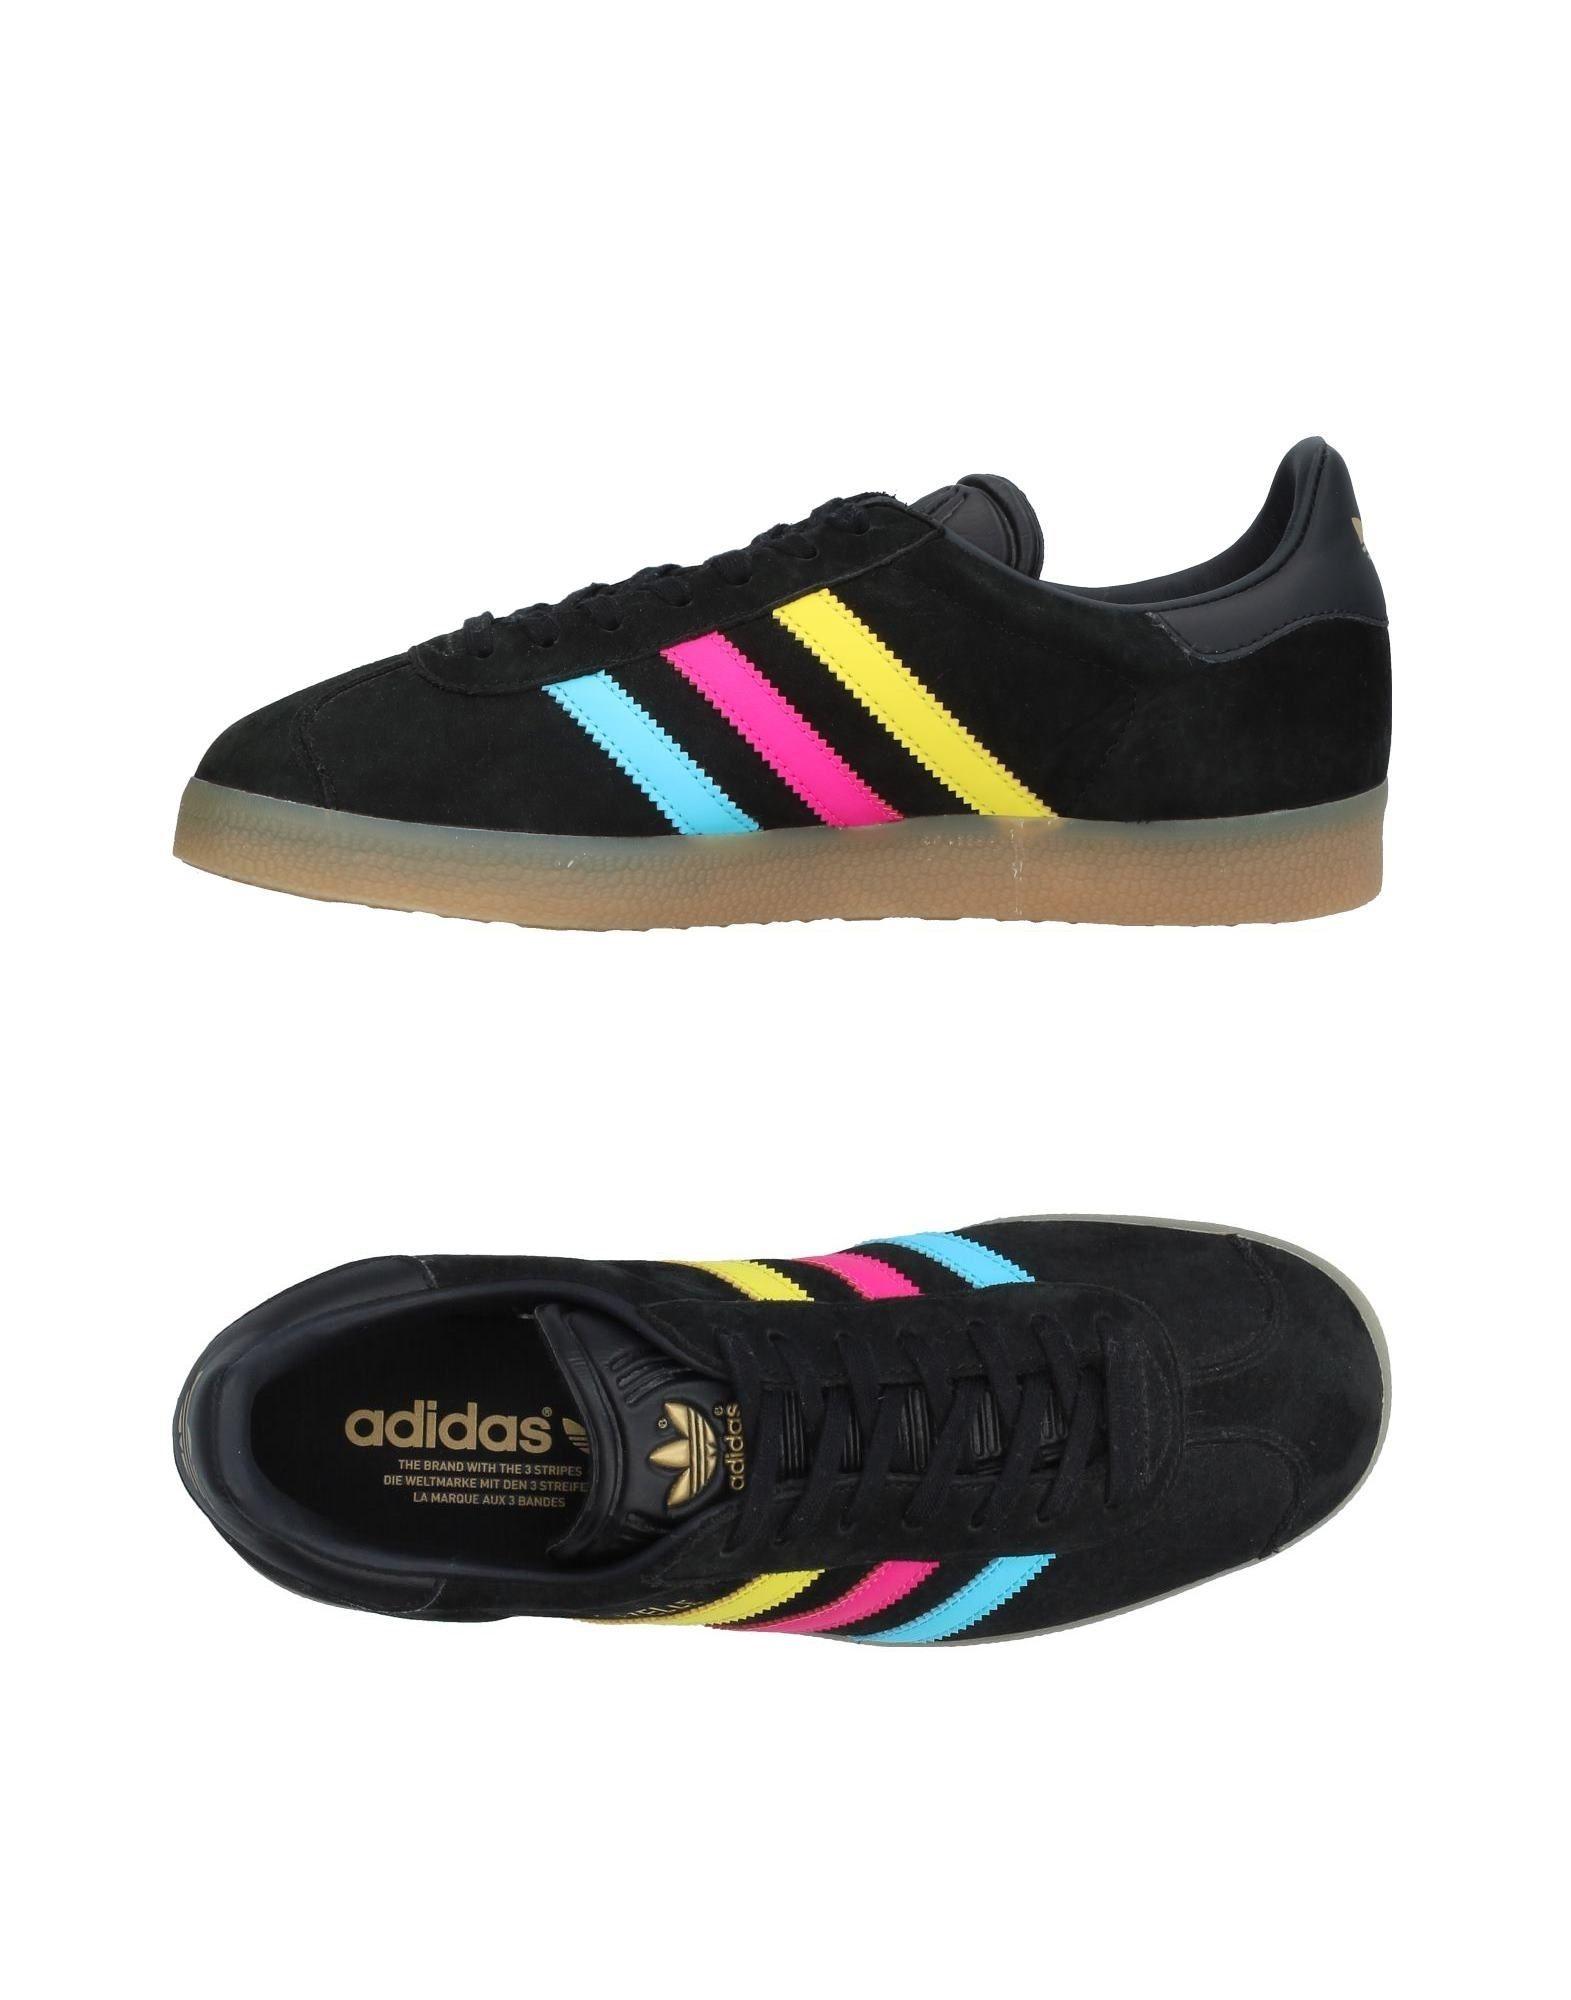 Adidas Originals Sneakers - Men Adidas Originals Sneakers online - on  United Kingdom - online 11410018JA 2ac1e3